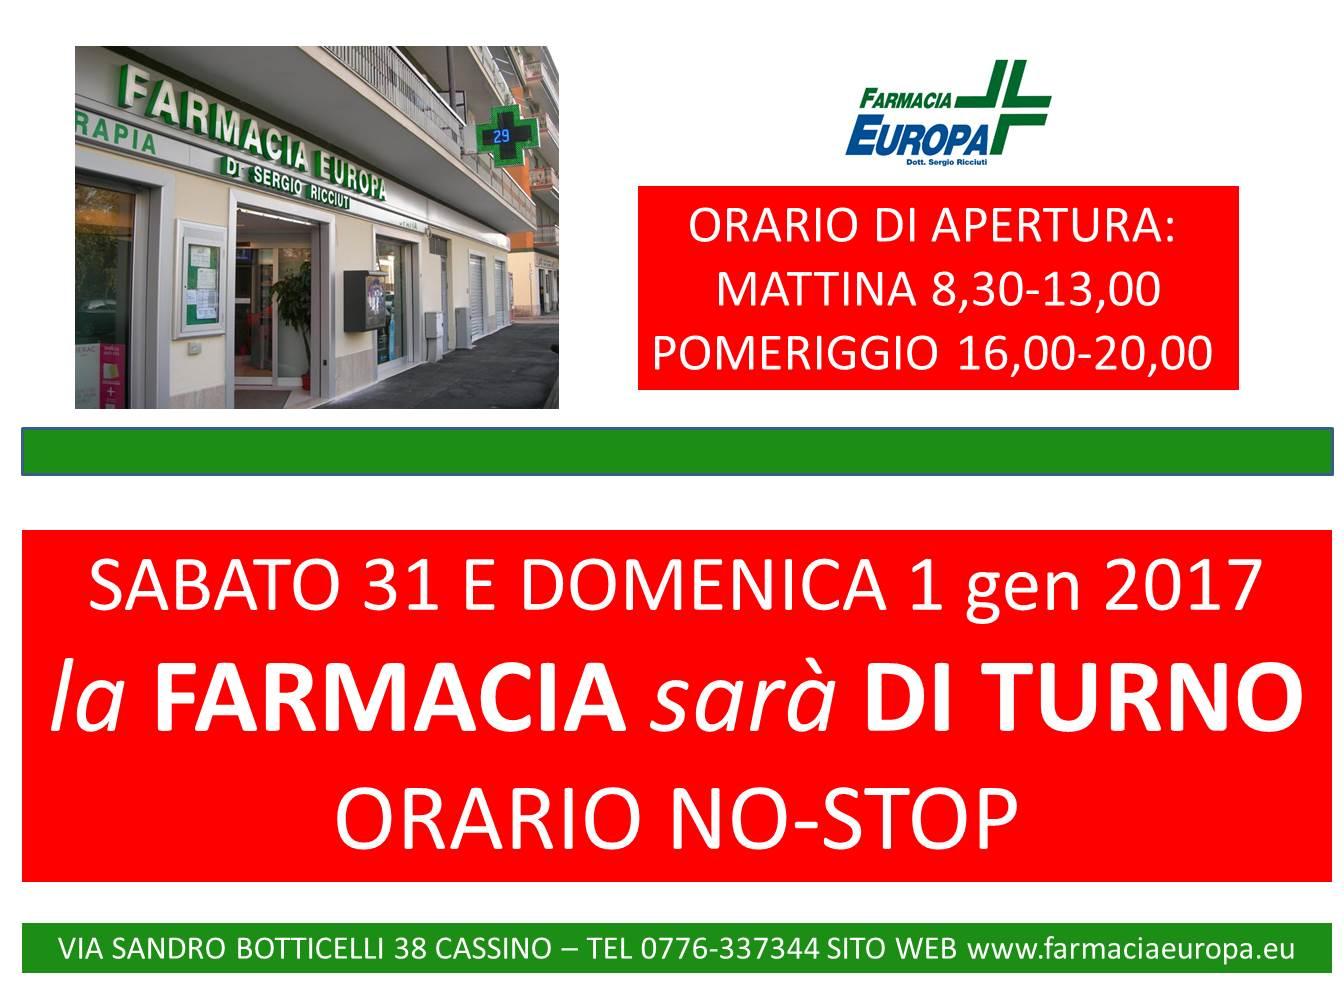 www bacheca incontri messina ebook reader